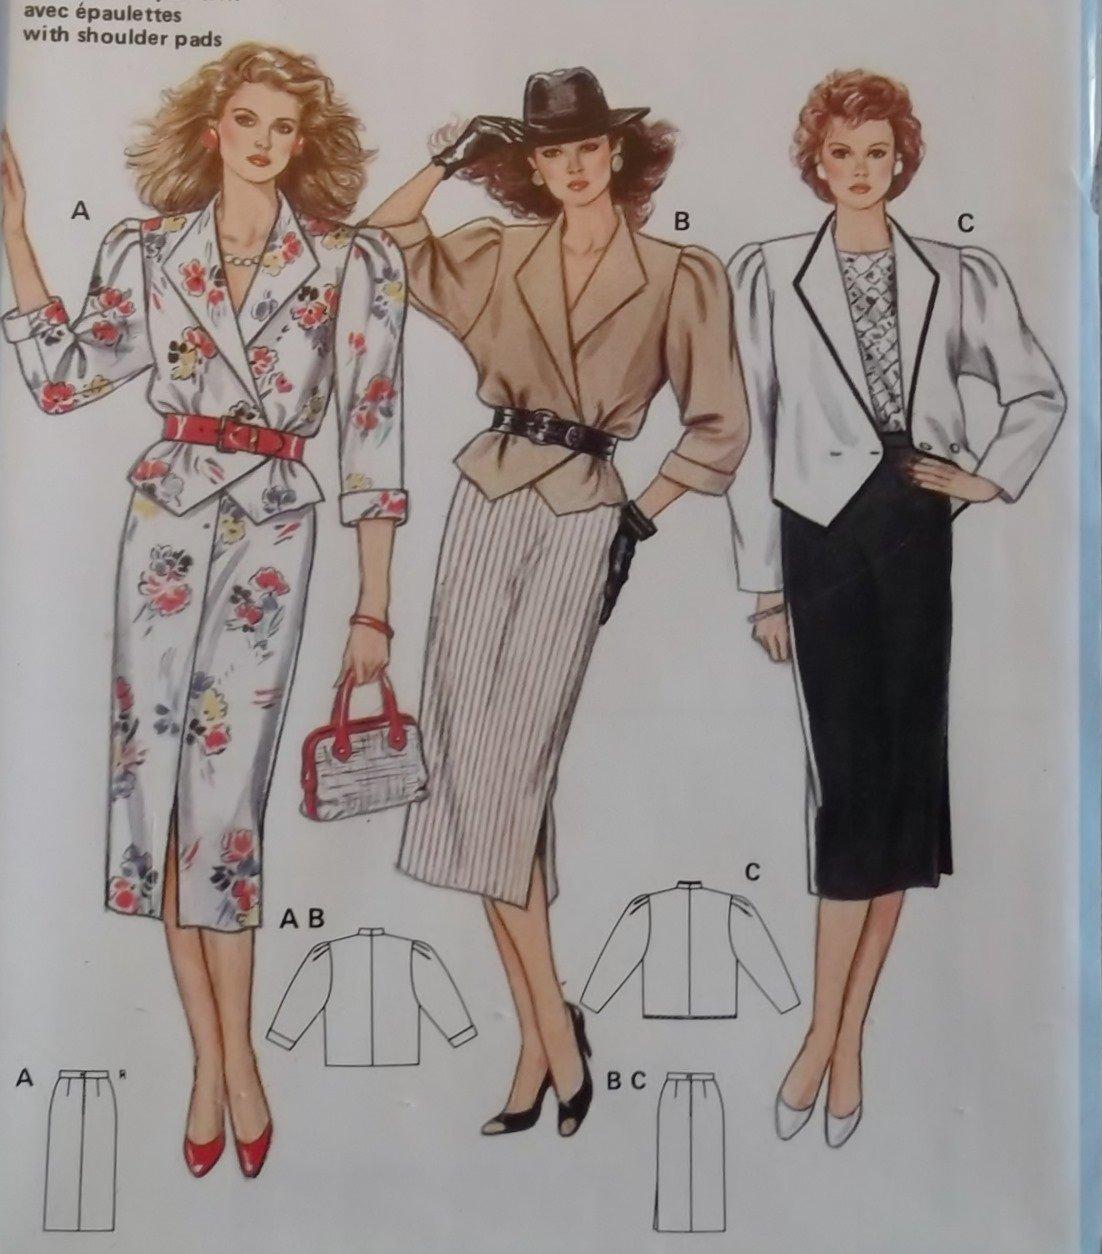 Burda 6399 Sewing Pattern Misses Jacket Skirt ,  Plus Size 8 10 12 14 16 18 20, Sealed